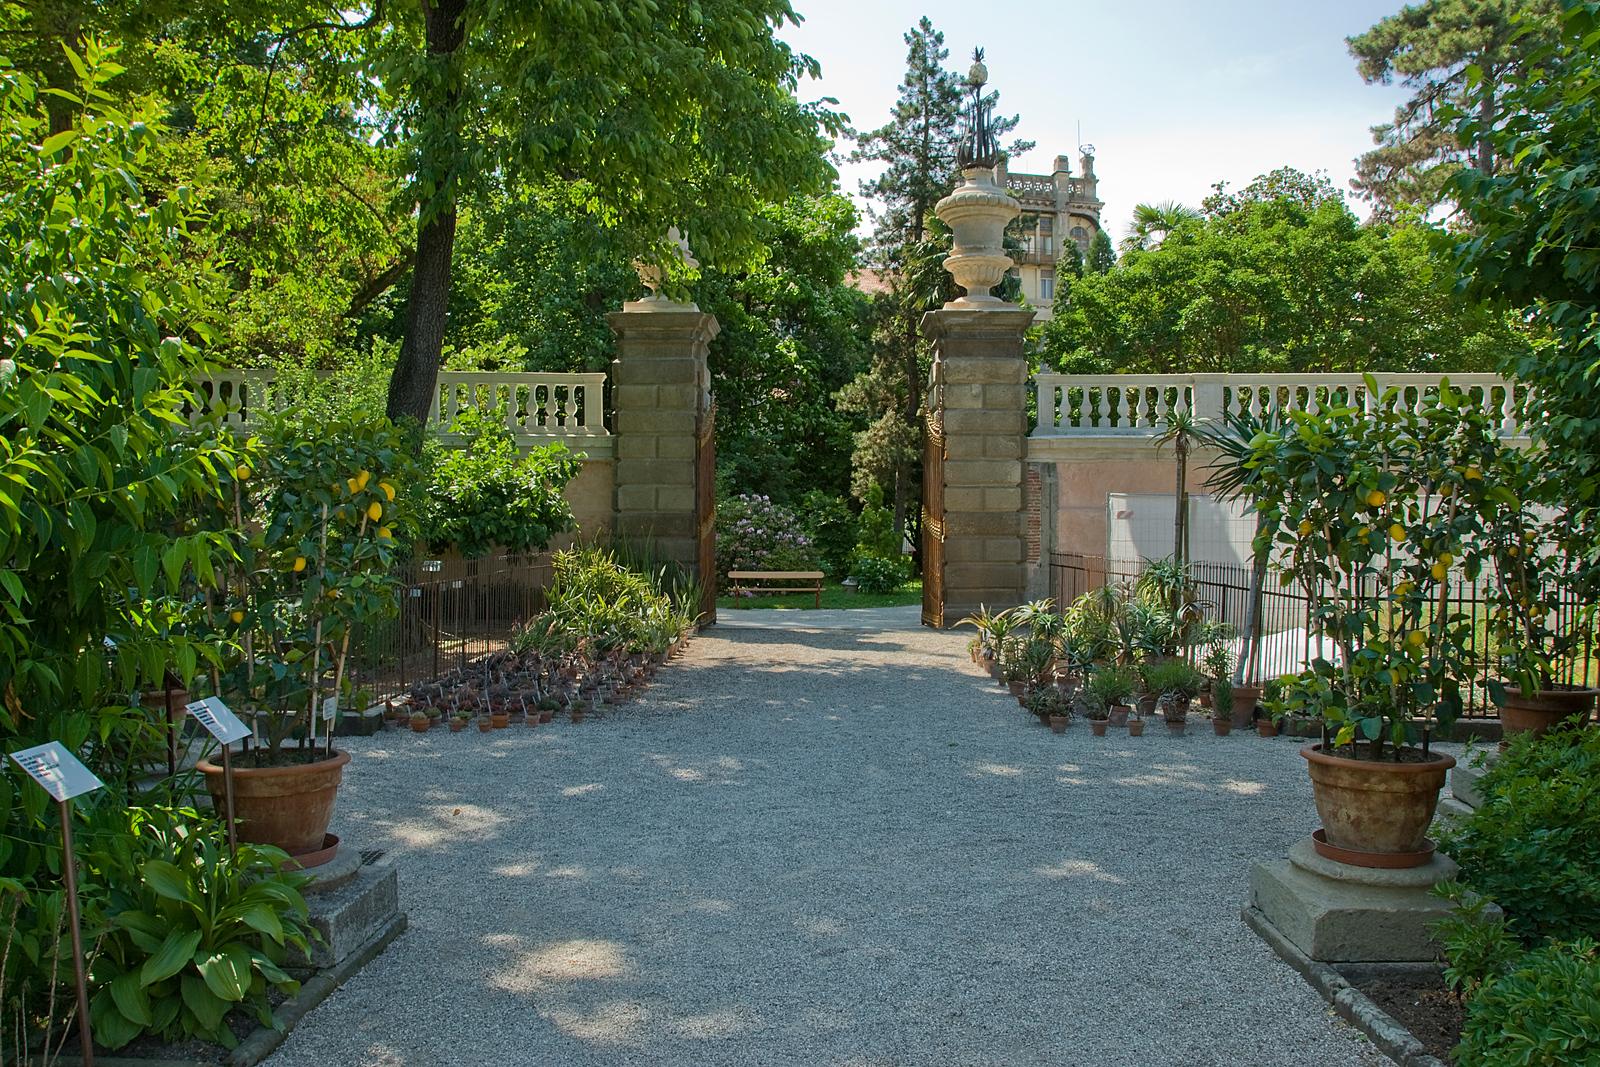 Botanical Garden (Orto Botanico), Padua - UNESCO World Heritage Site